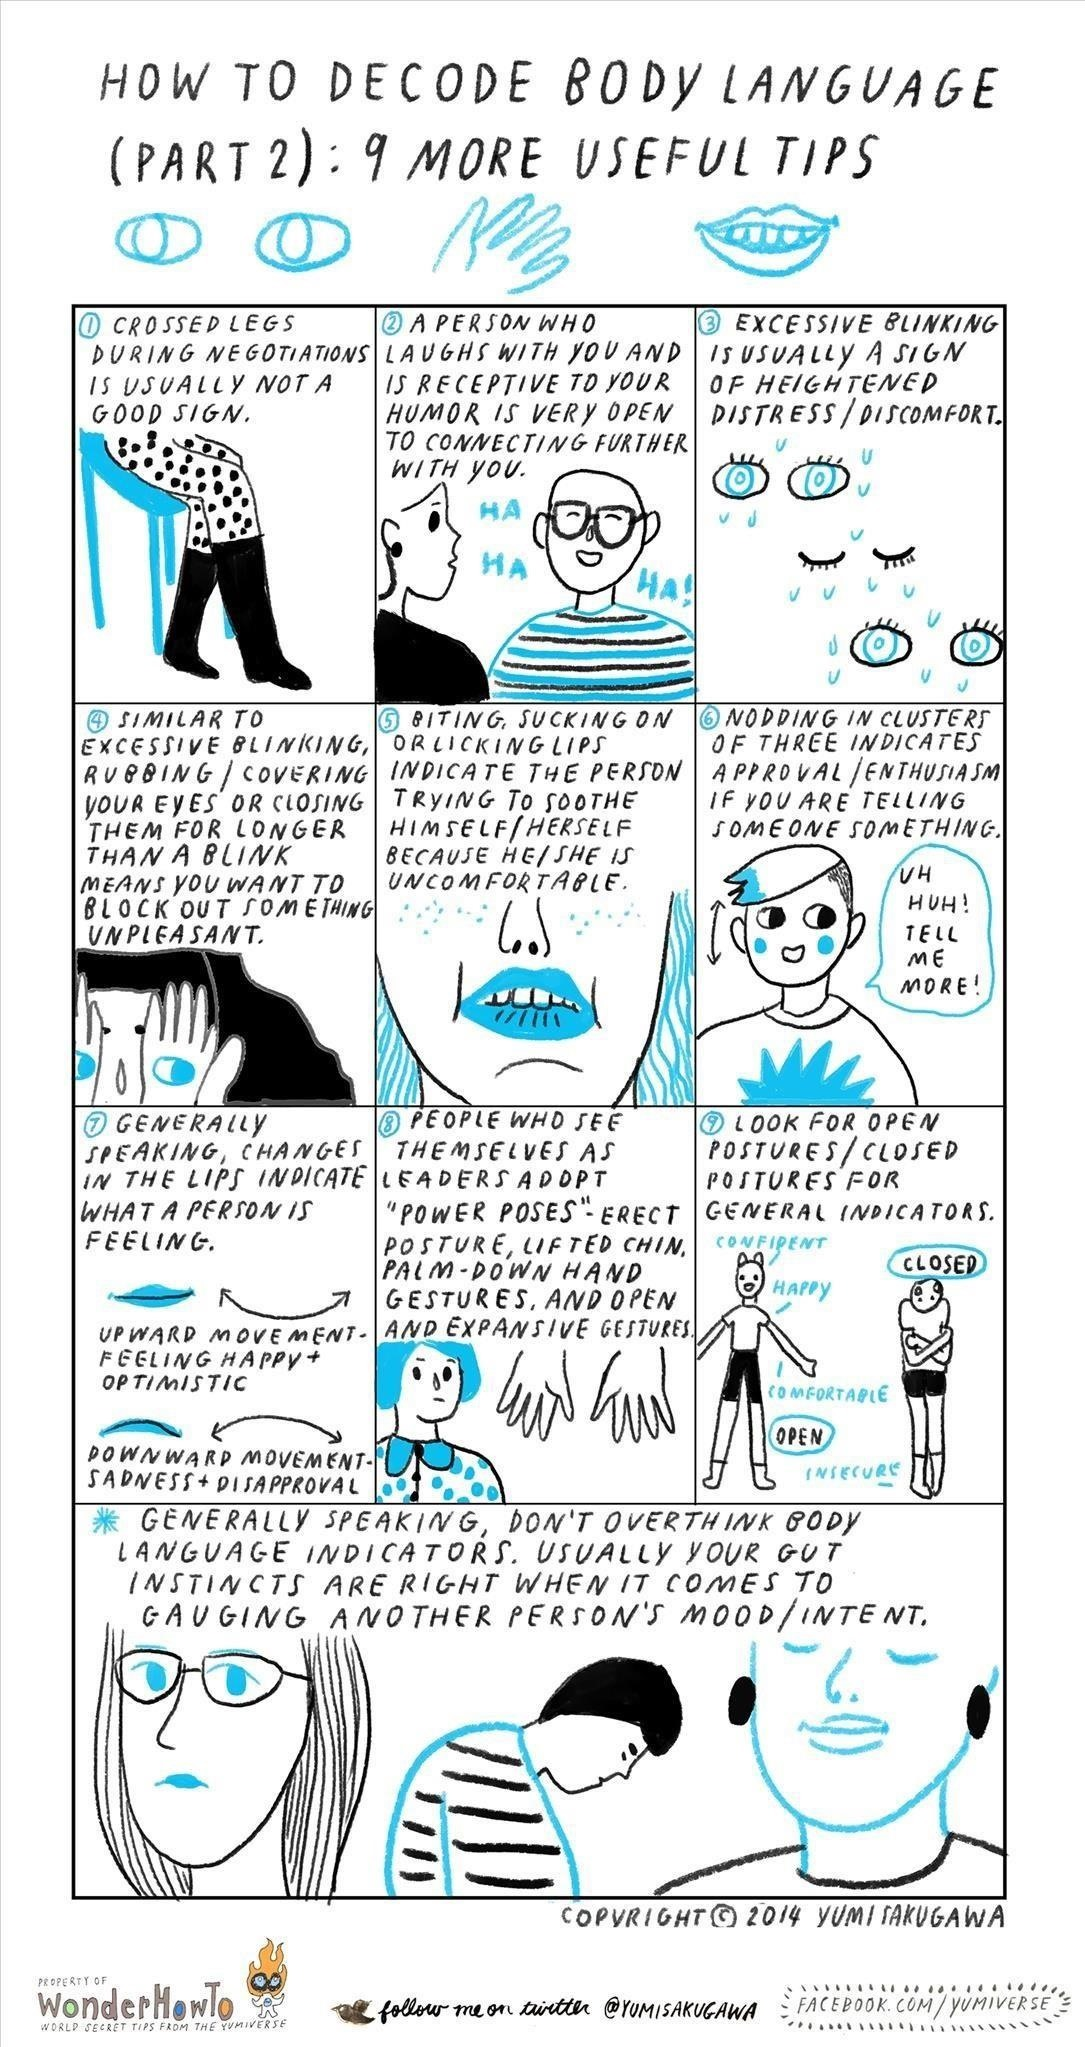 How to Decode Body Language, Part 2: Interpreting Peoples